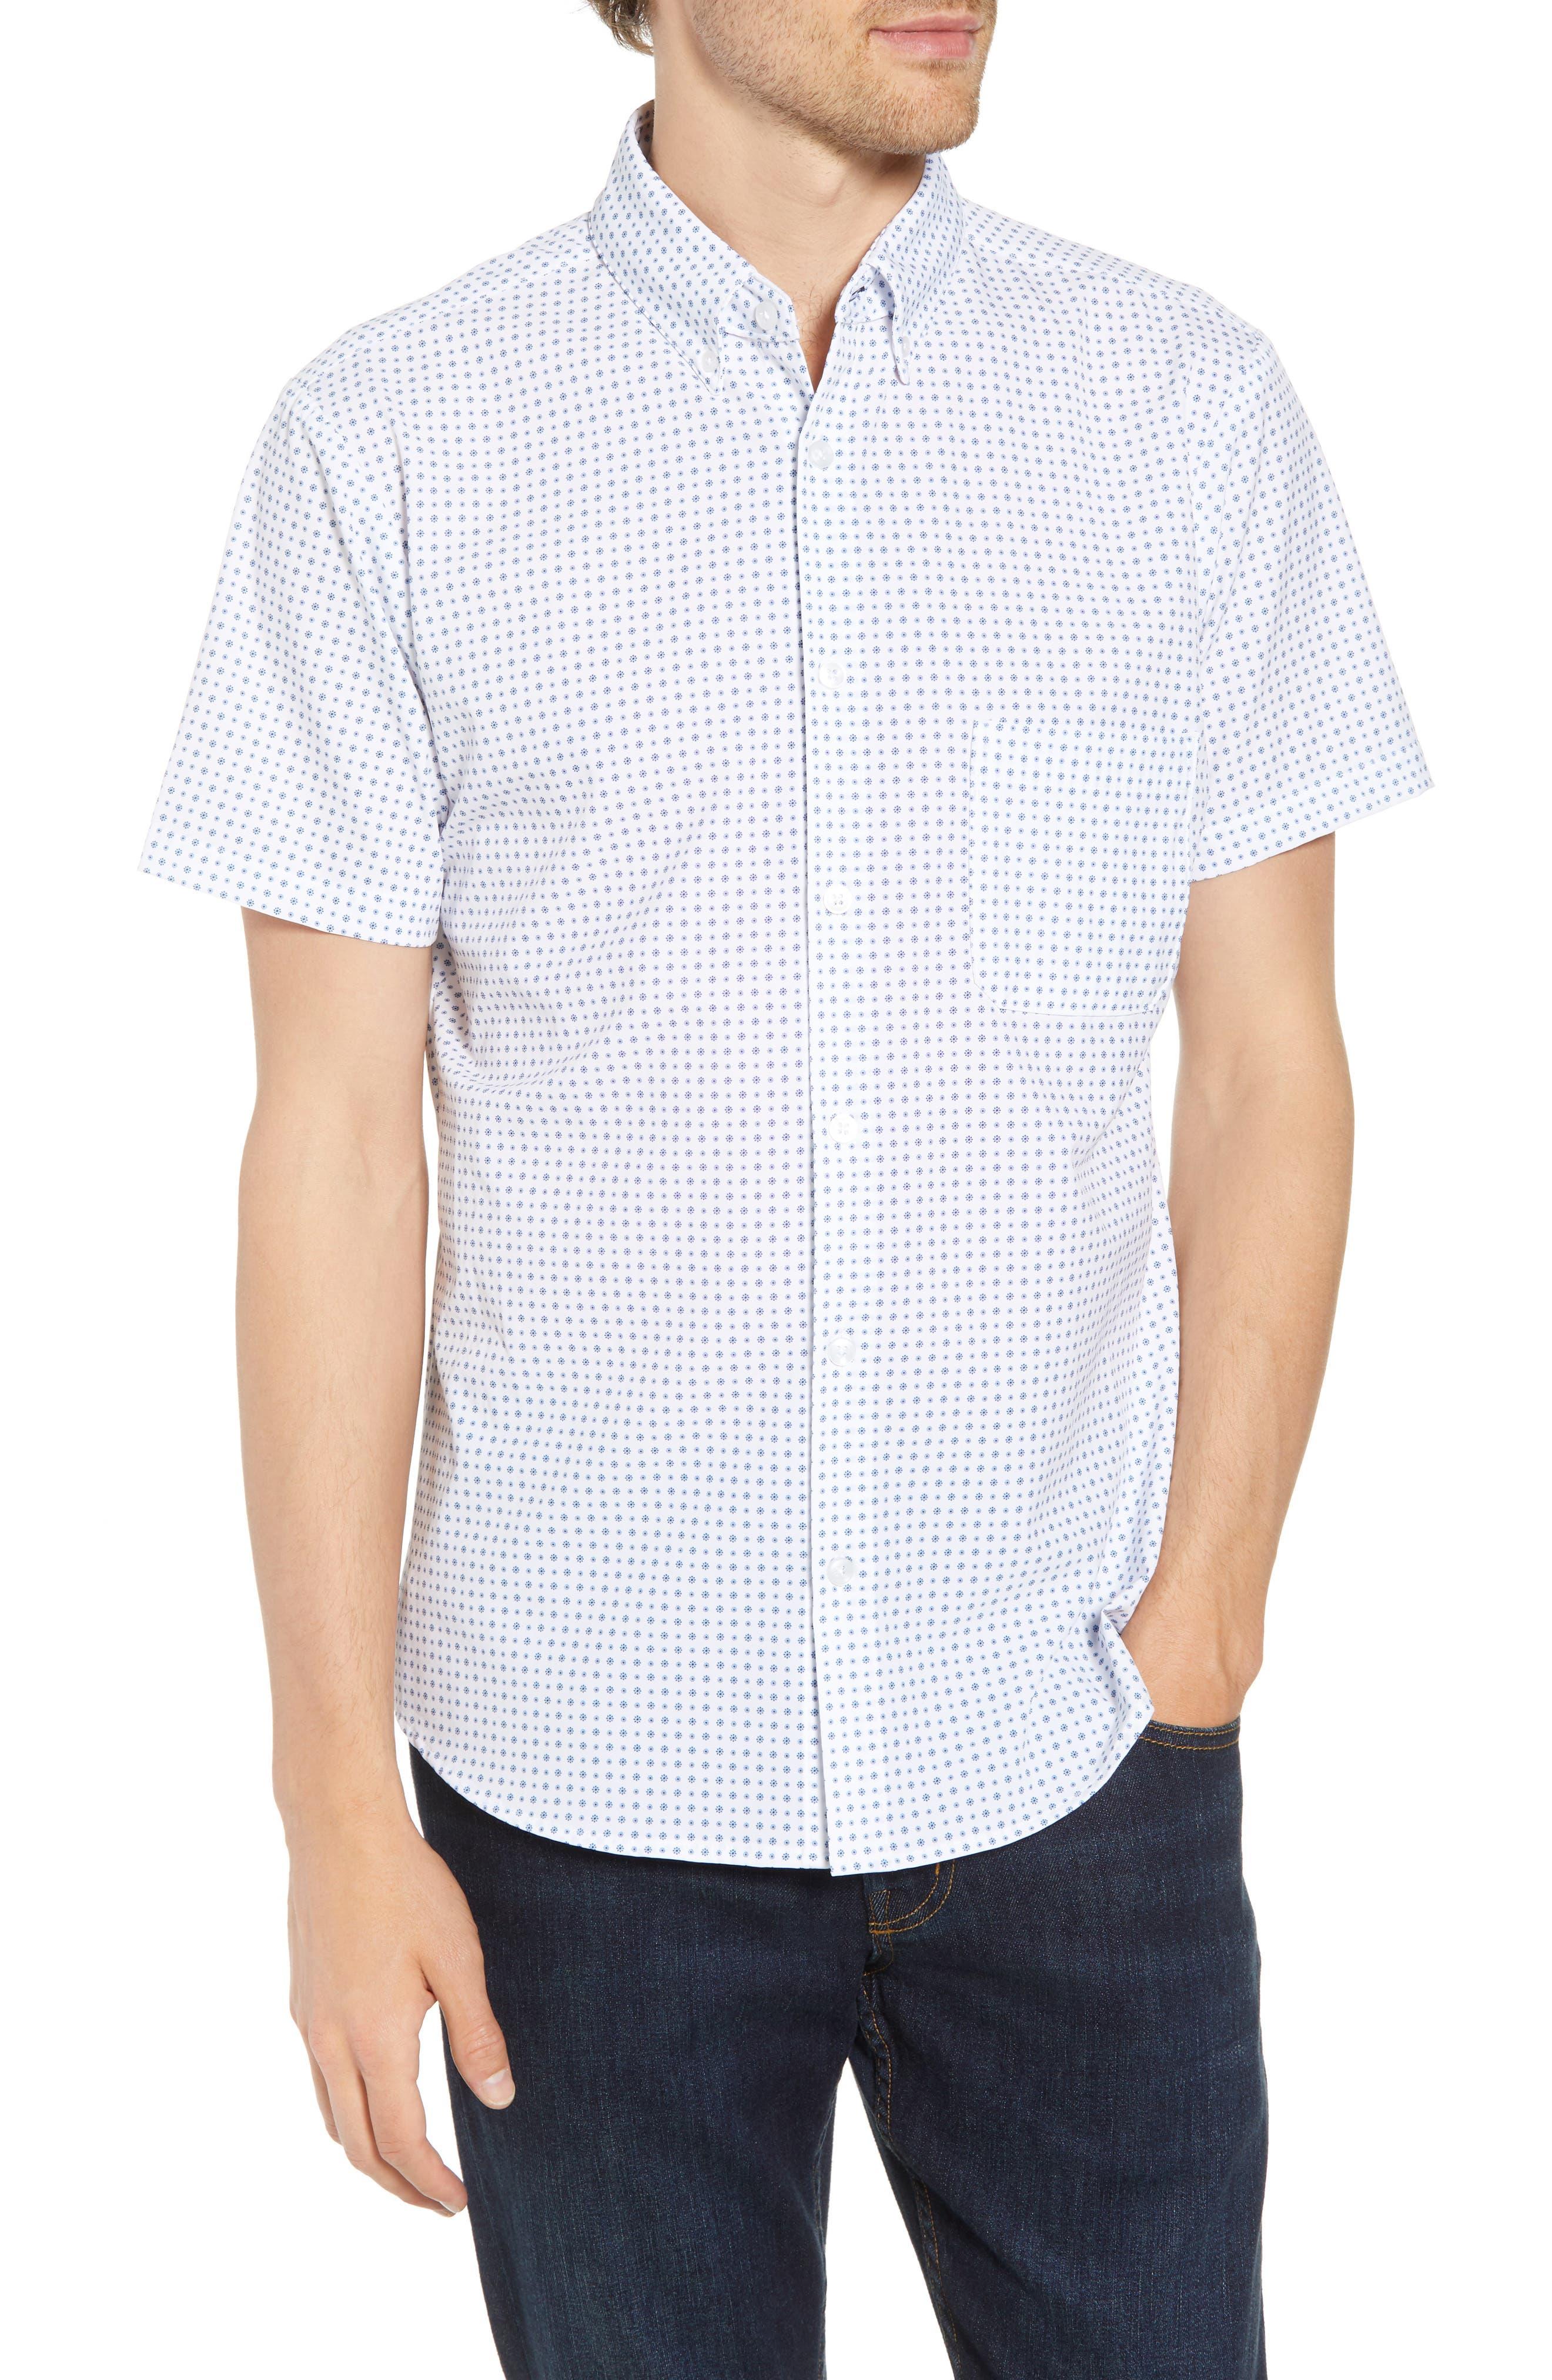 Darst Slim Fit Performance Sport Shirt,                         Main,                         color, White